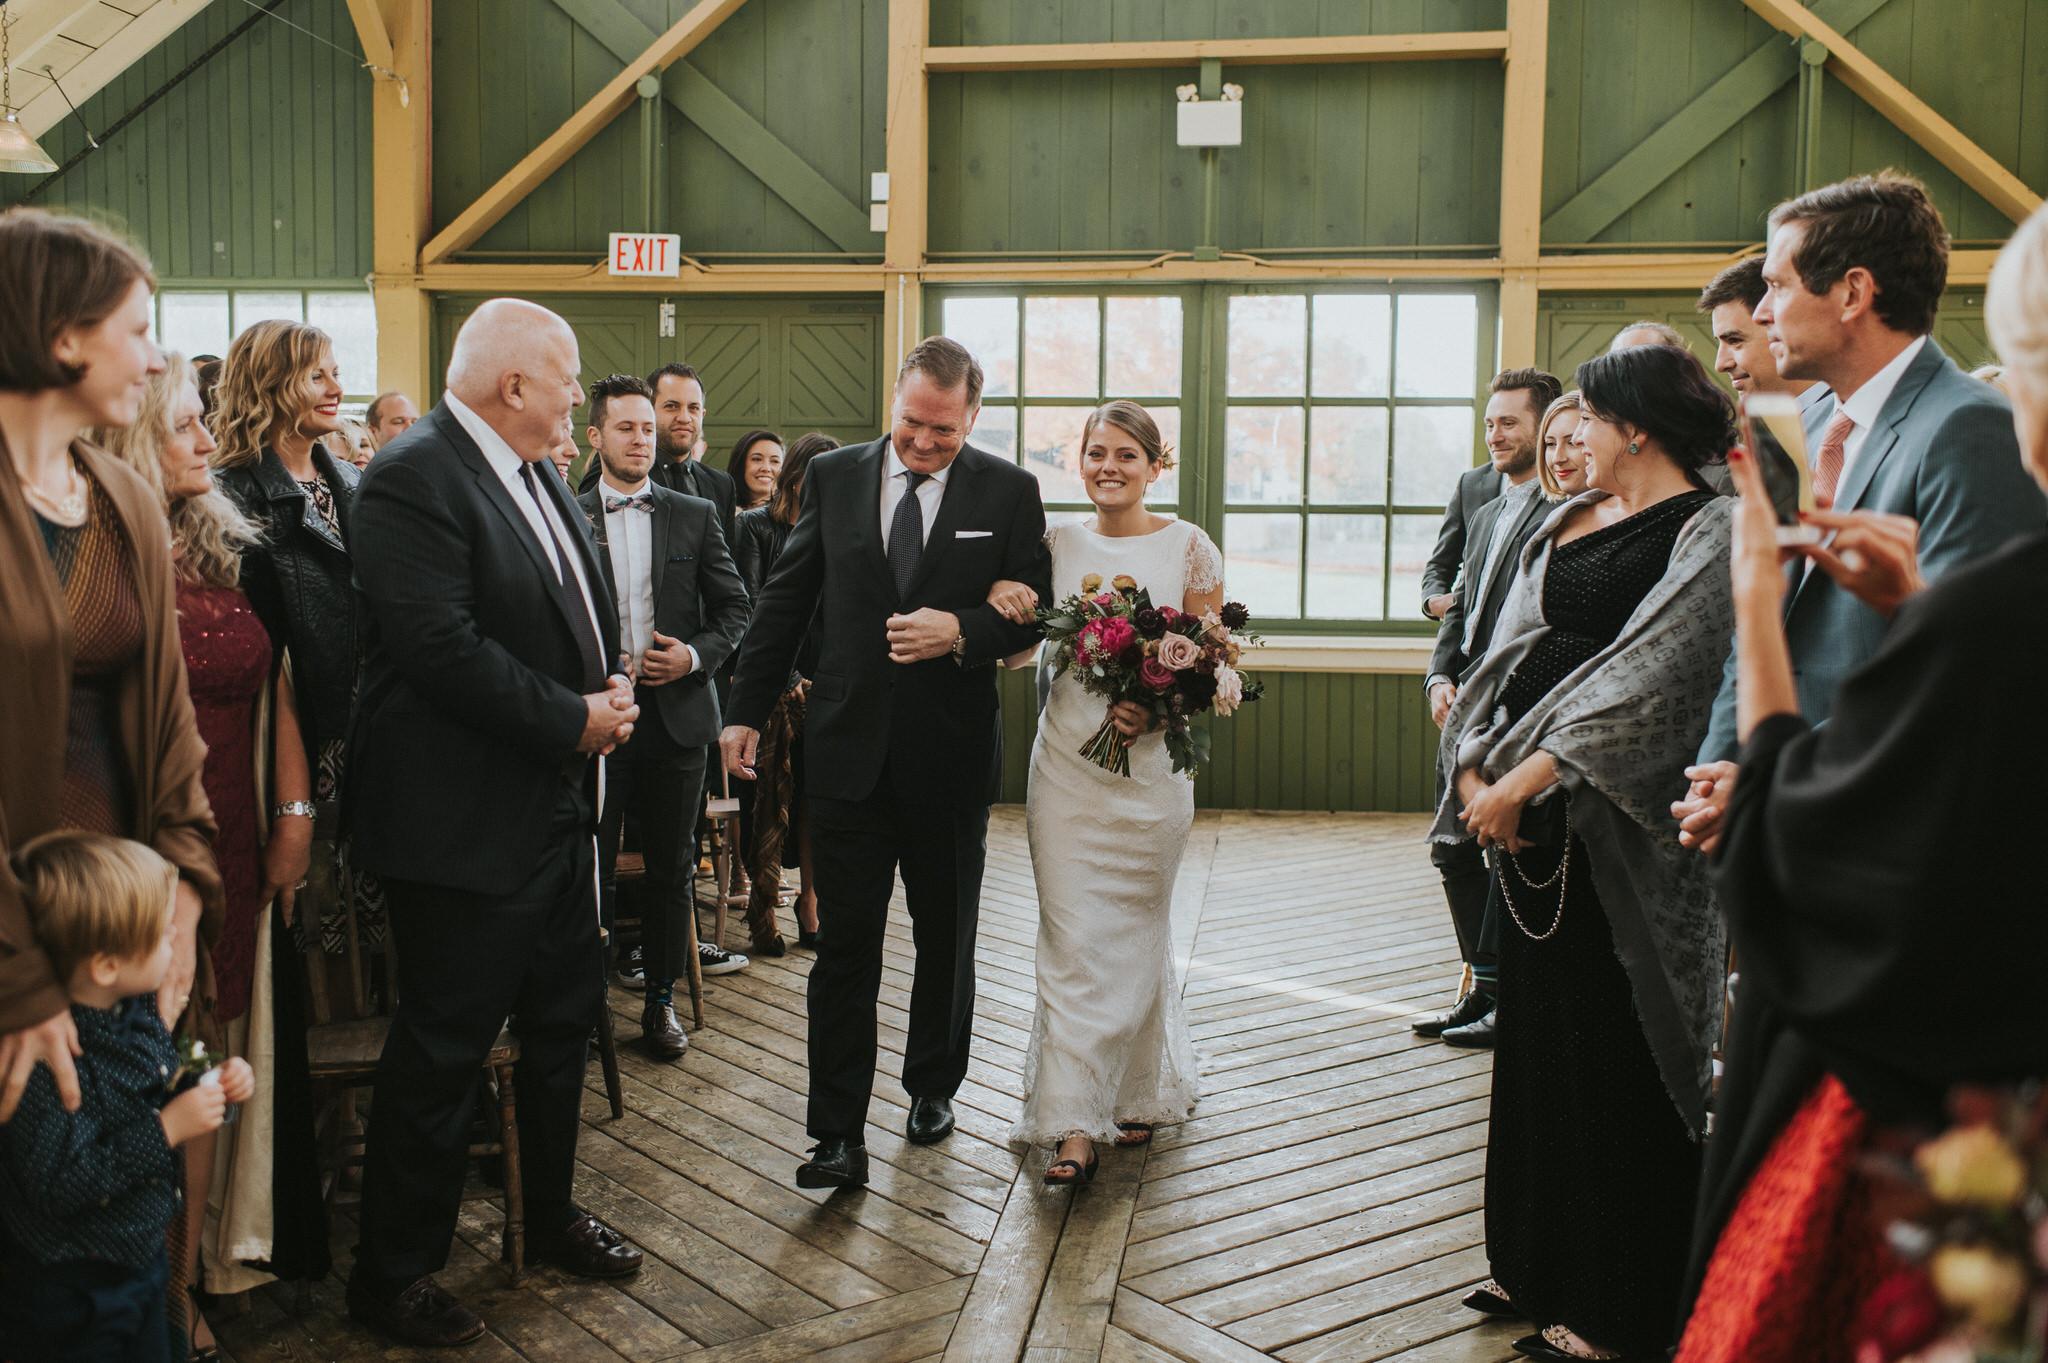 scarletoneillphotography_weddingphotography_prince edward county weddings110.JPG